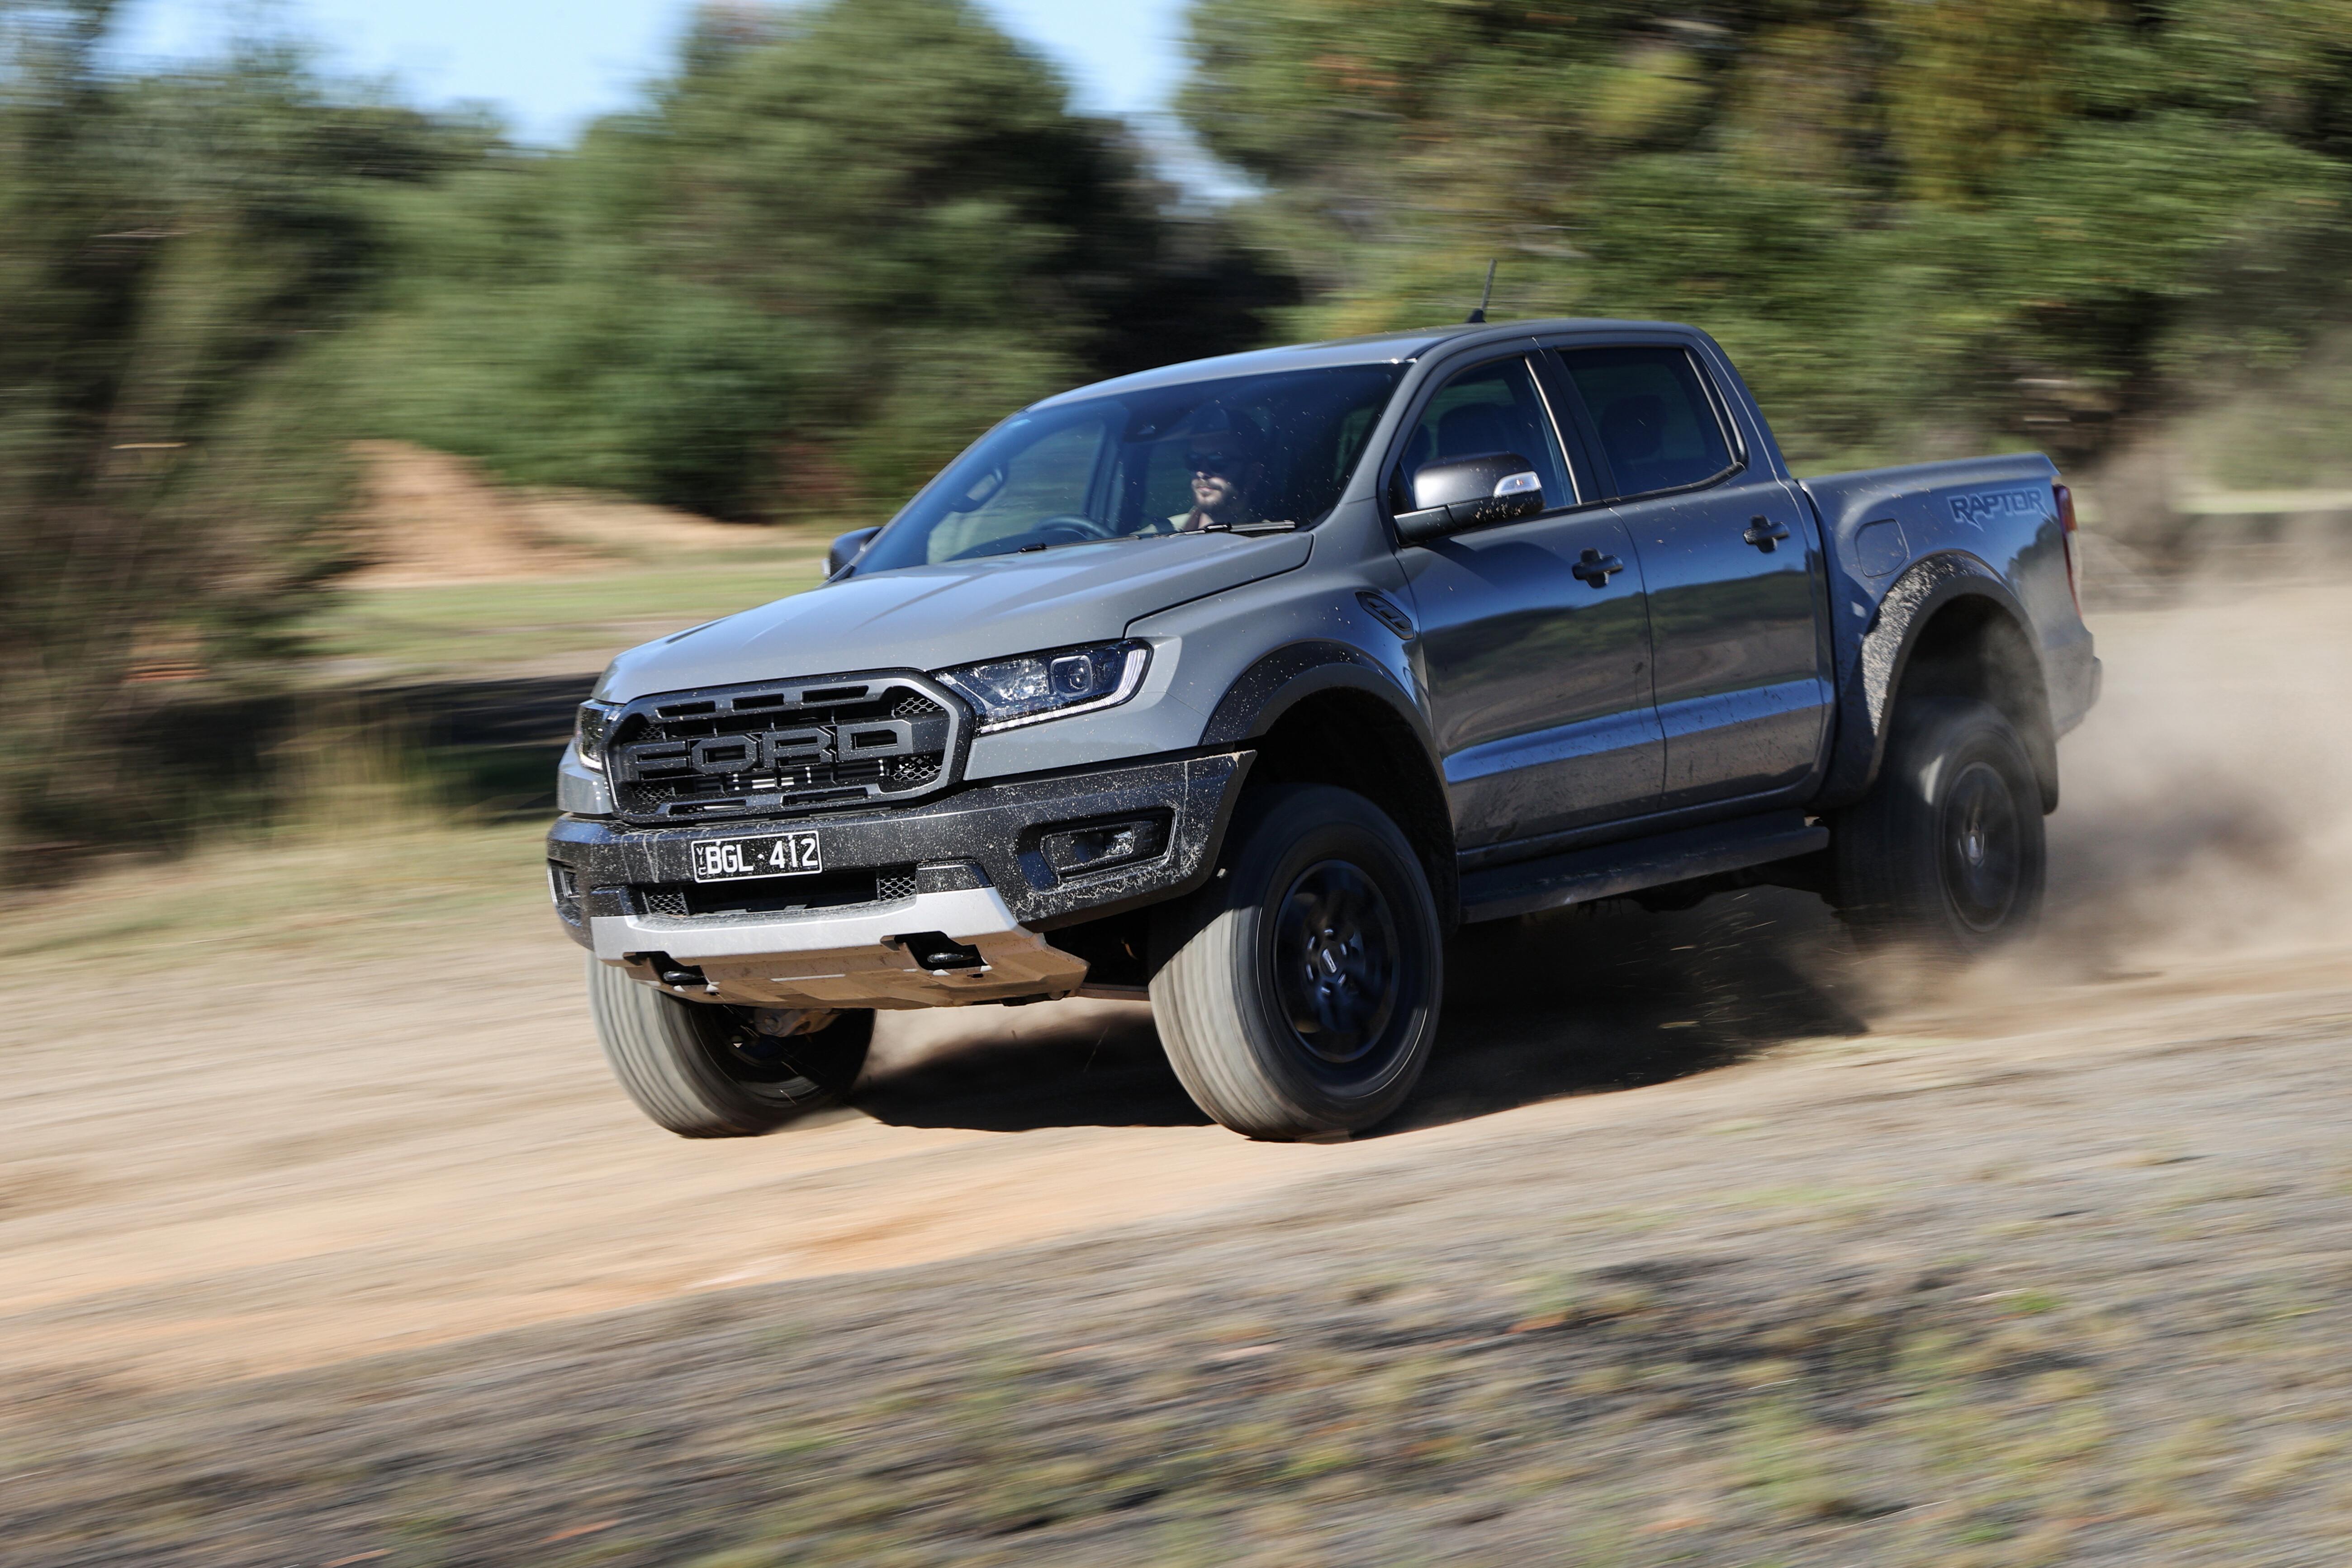 4 X 4 Australia Comparisons 2021 May 21 Ford Ranger Raptor Off Road Handling